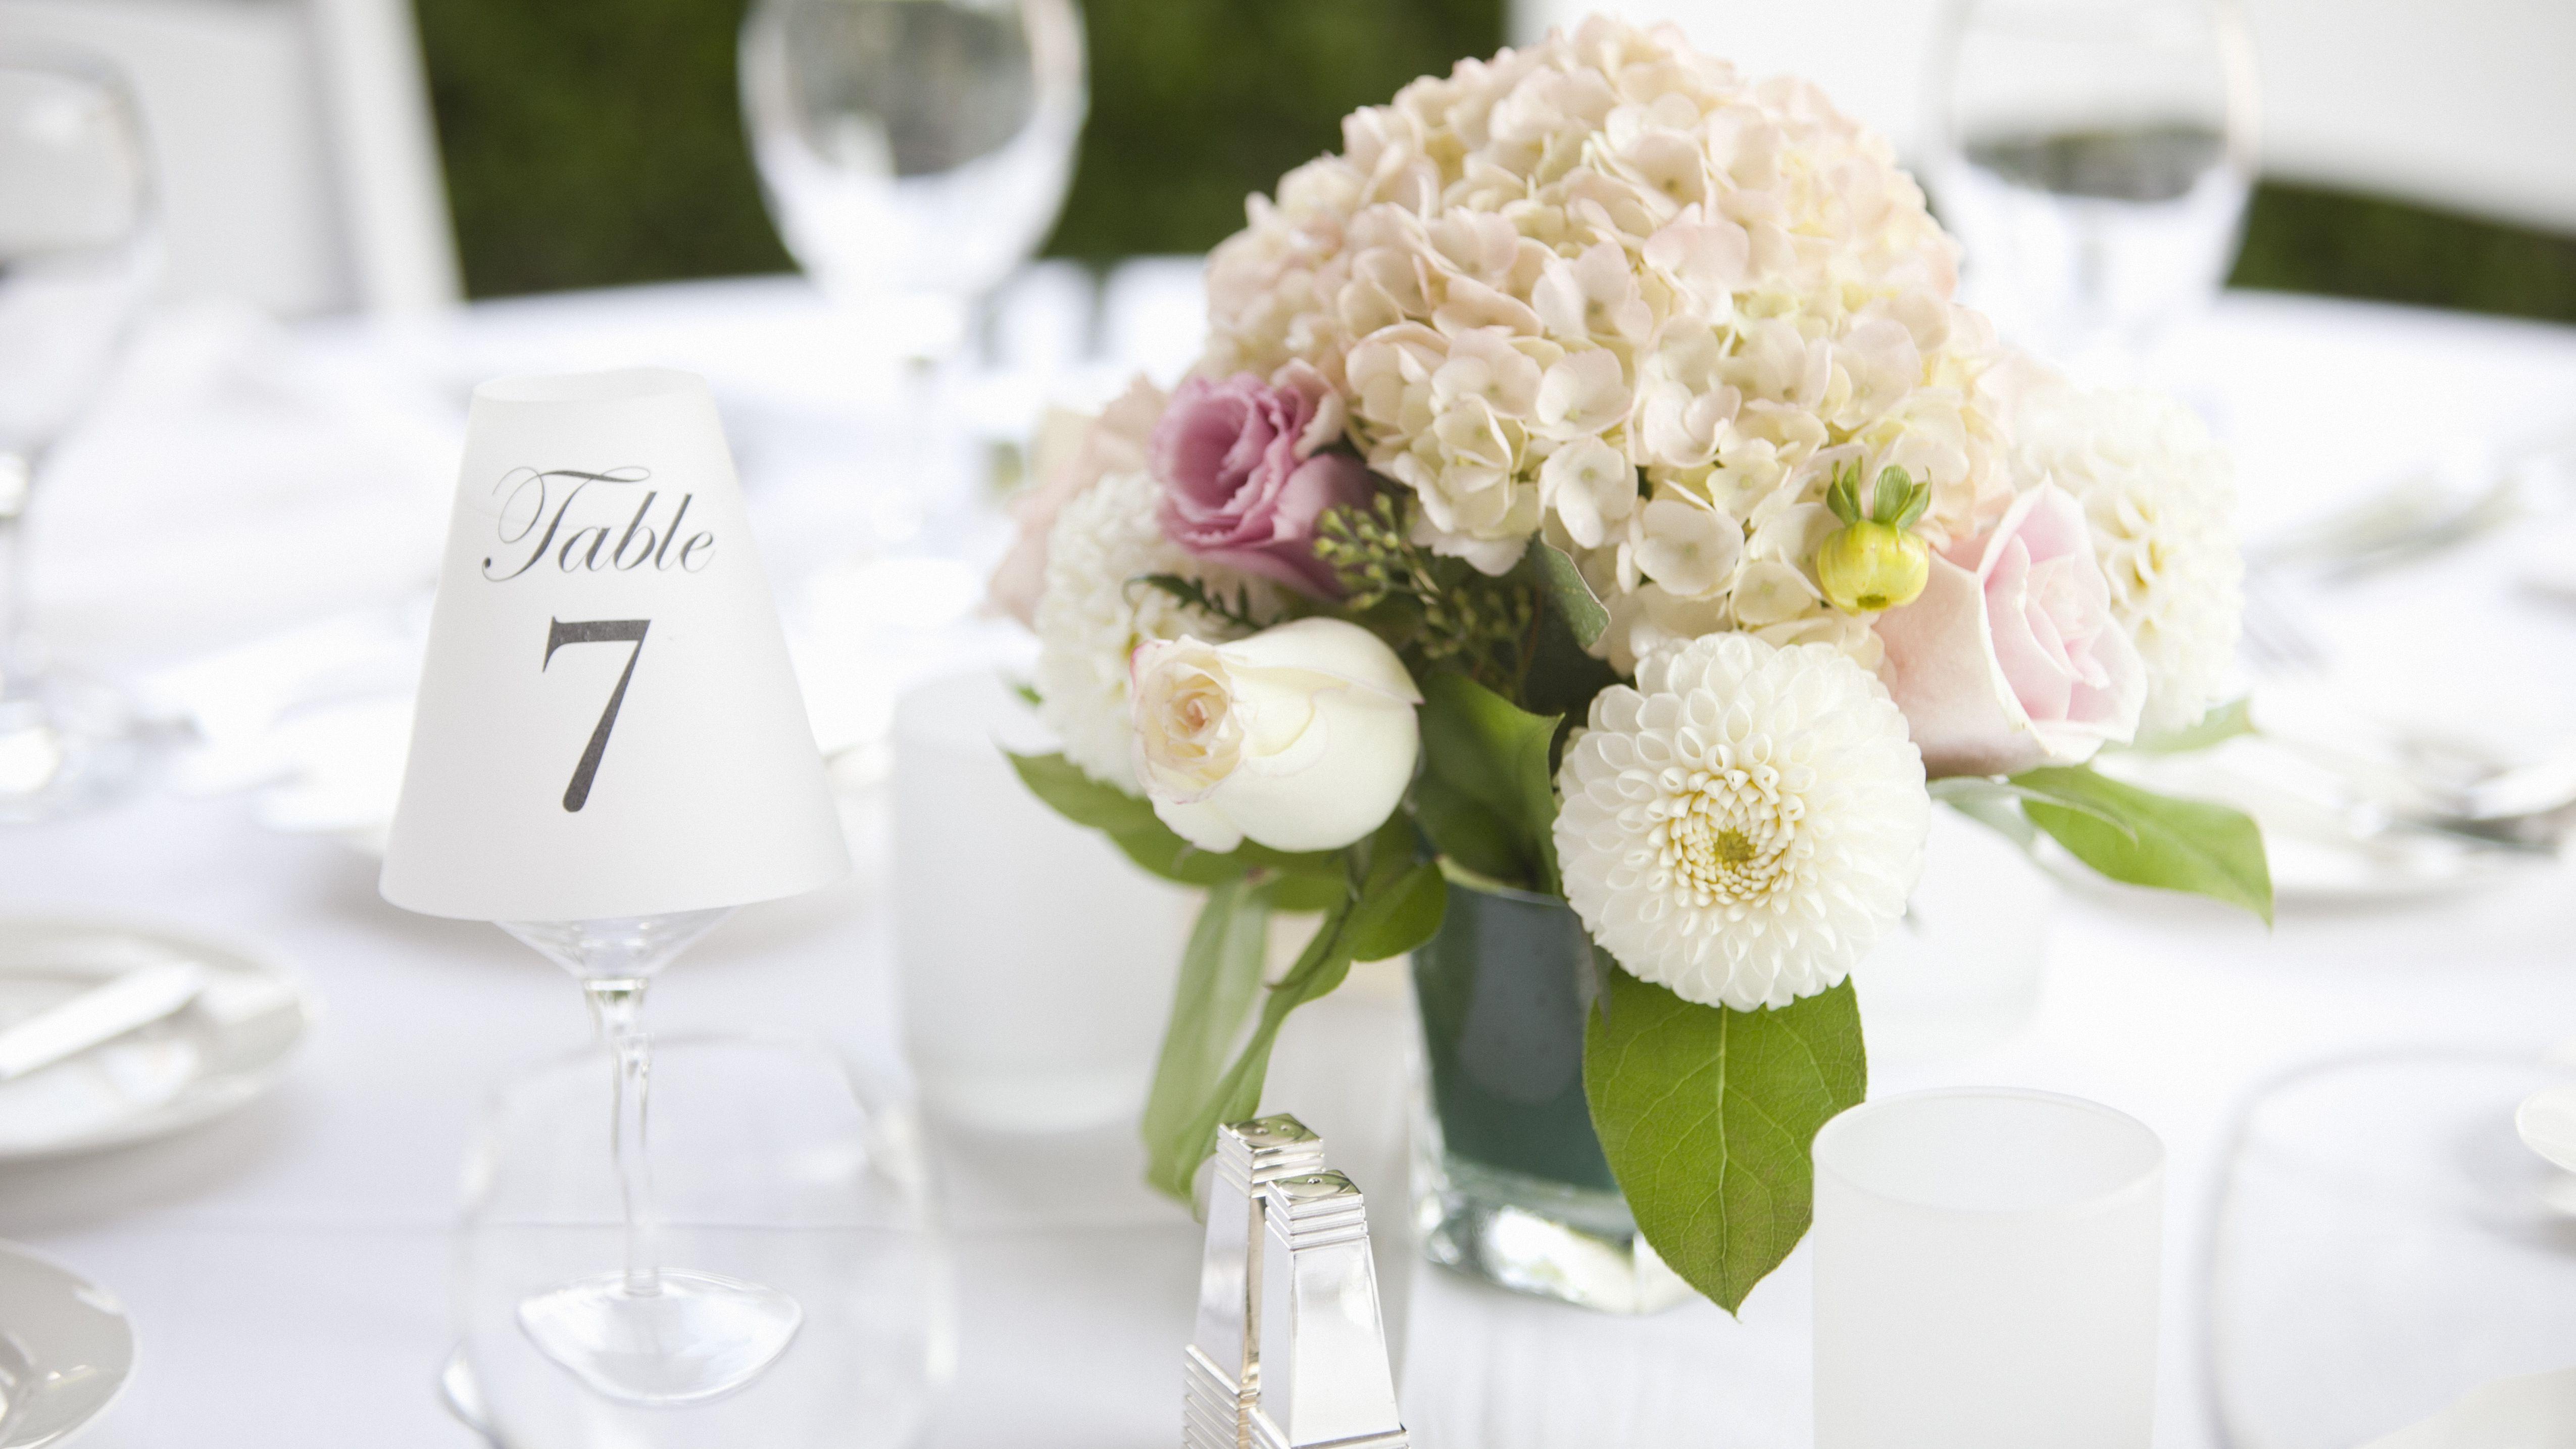 10 Sets of Free, Printable Wedding Table Numbers